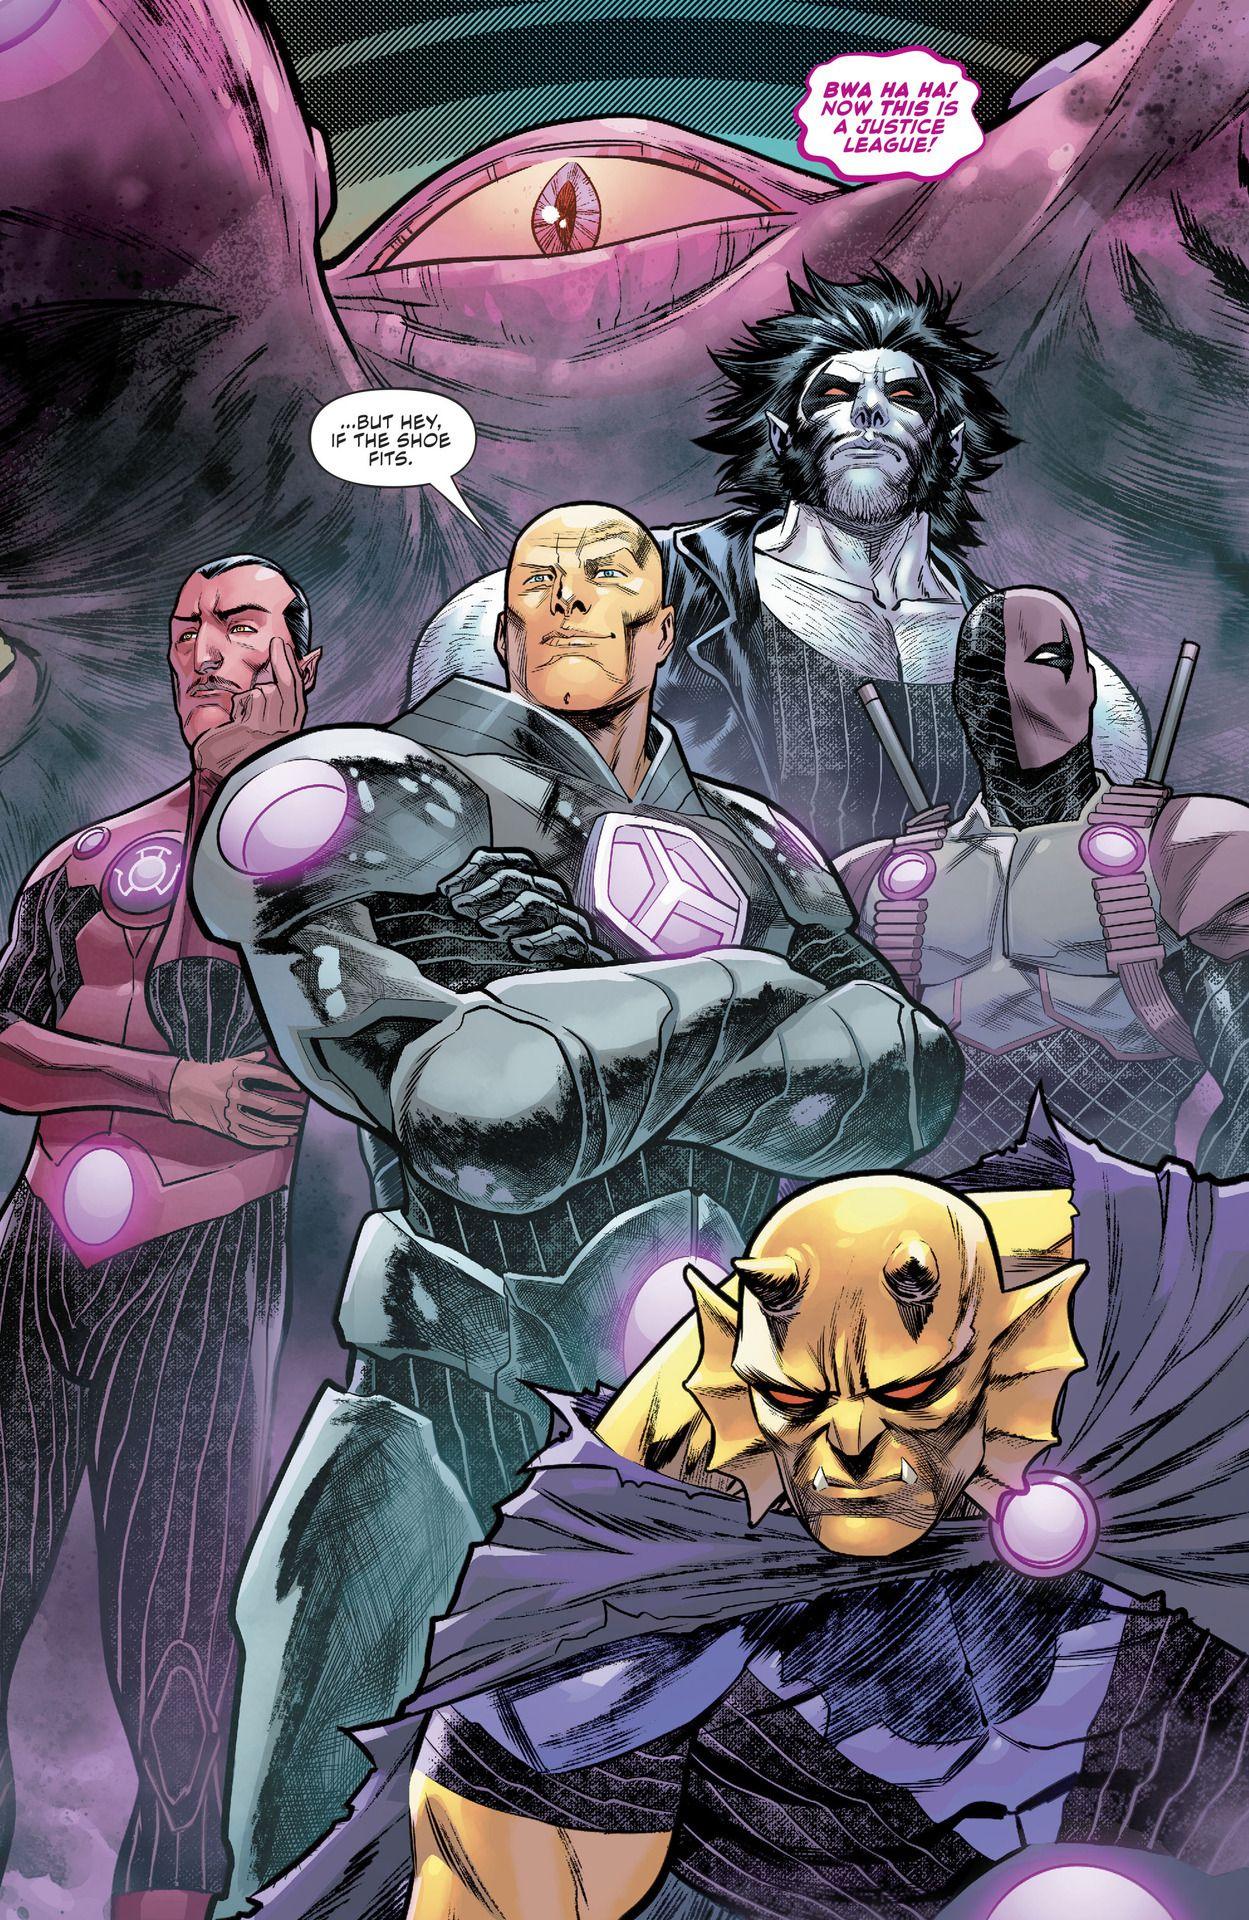 Towritecomicsonherarms Justice League No Justice 1 Justice League Dc Comics Art Dc Comics Characters